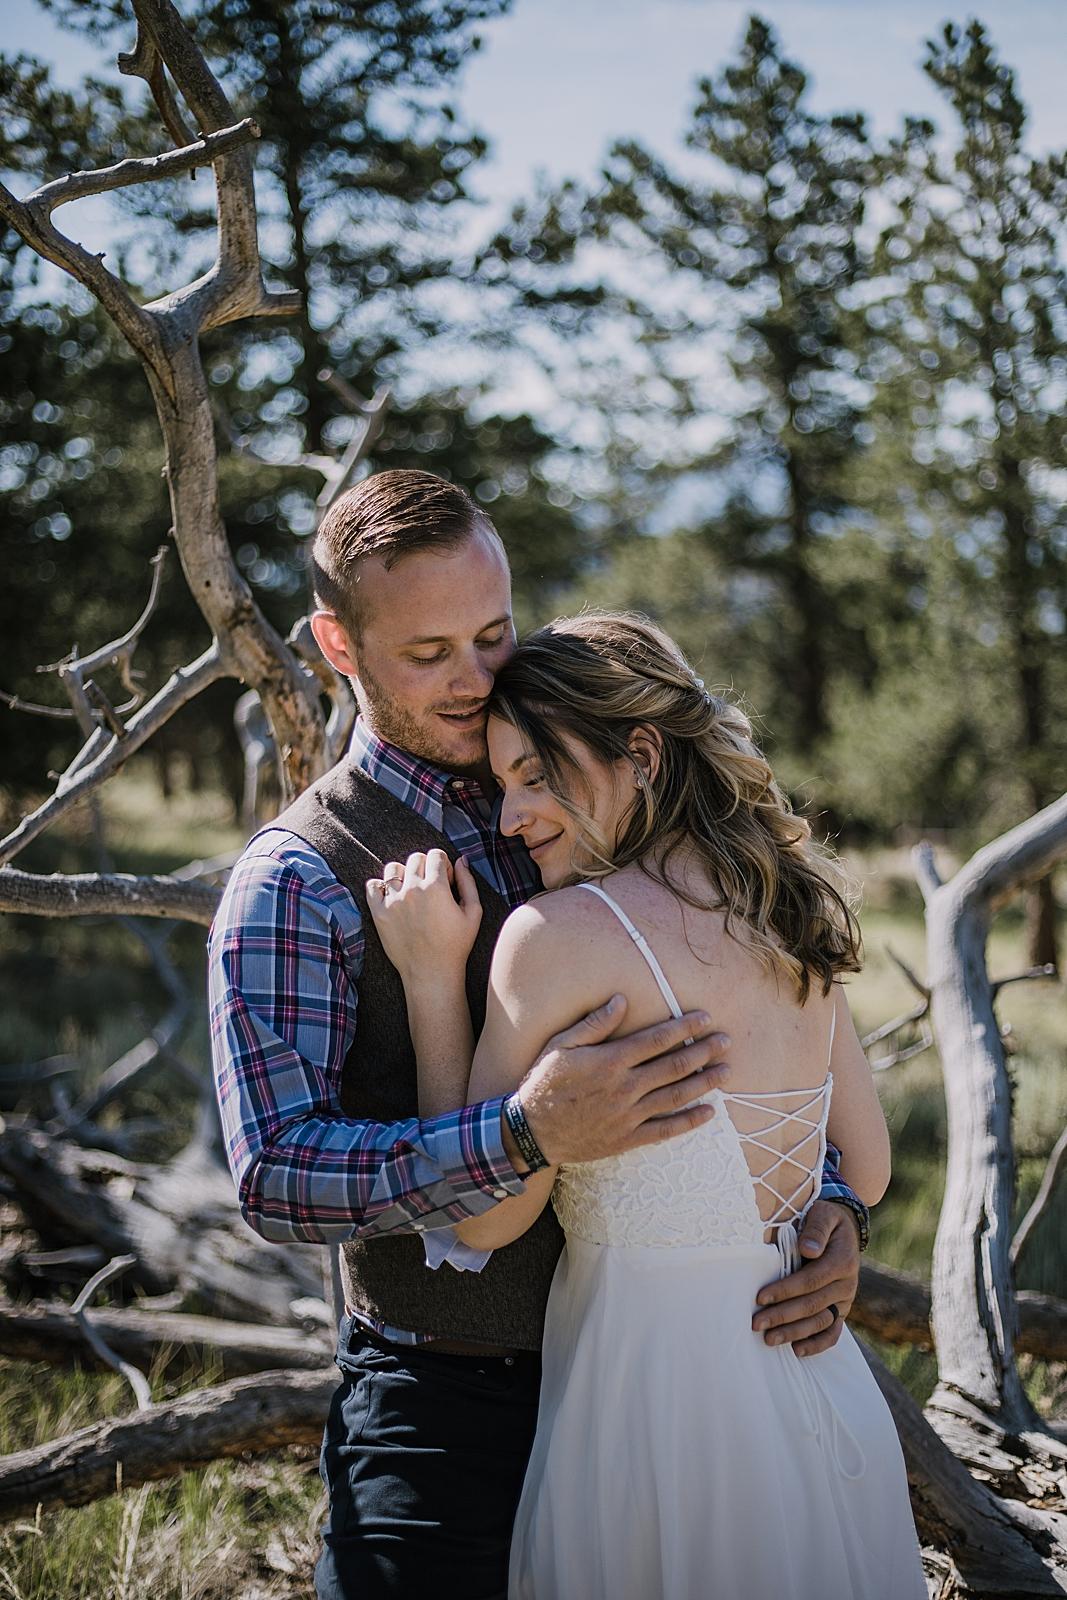 couple hiking, RMNP elopement ceremony, rocky mountain national park elopement, 3M curves elopement, self solemnizing, self solemnization, long's peak, summer hiking elopement, estes park elopement